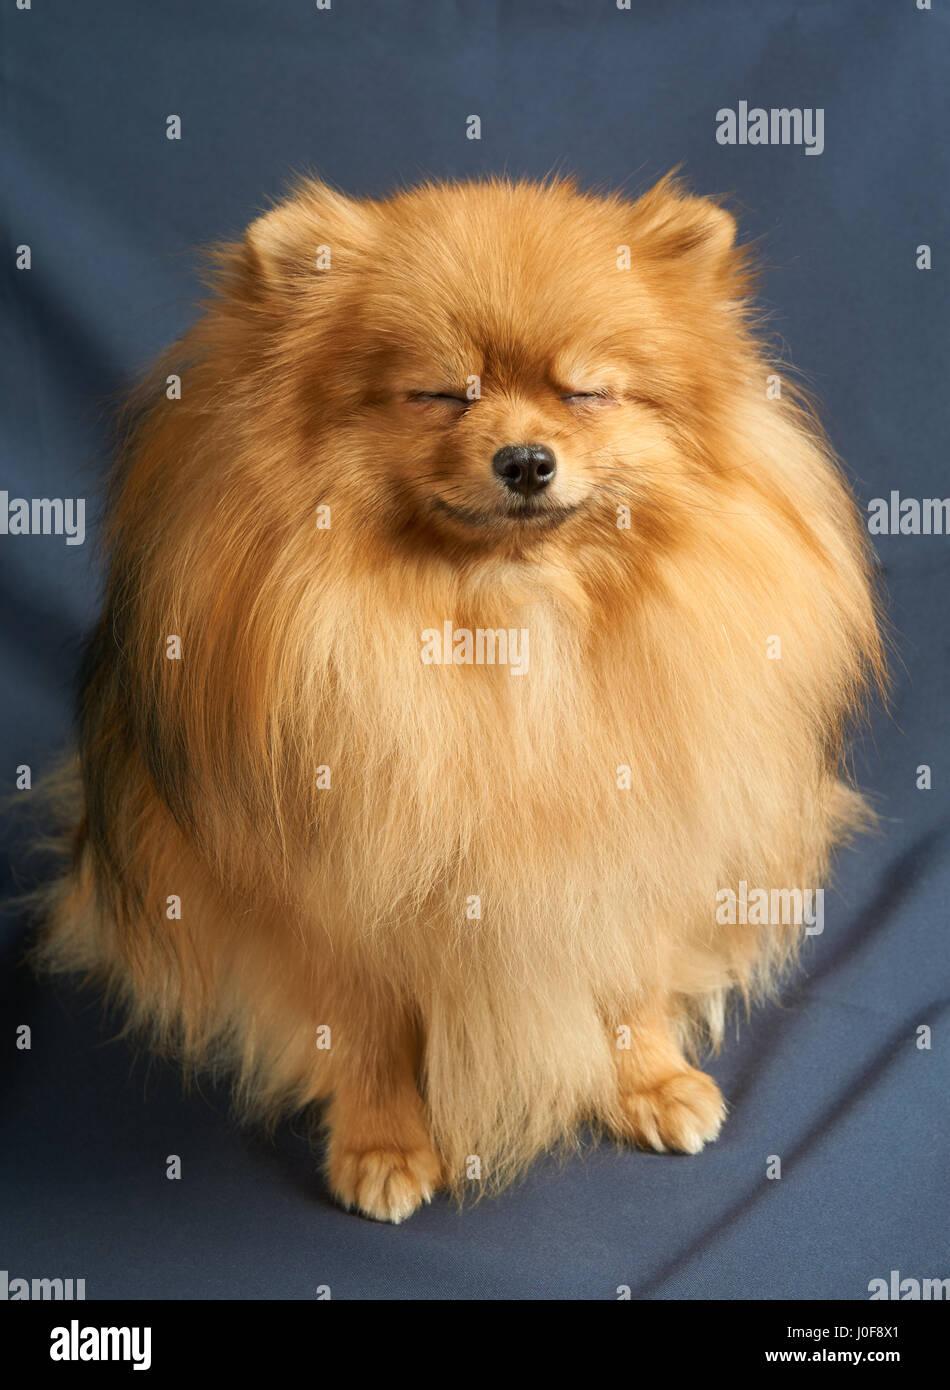 Pomeranian Dog Show Stock Photos & Pomeranian Dog Show ...